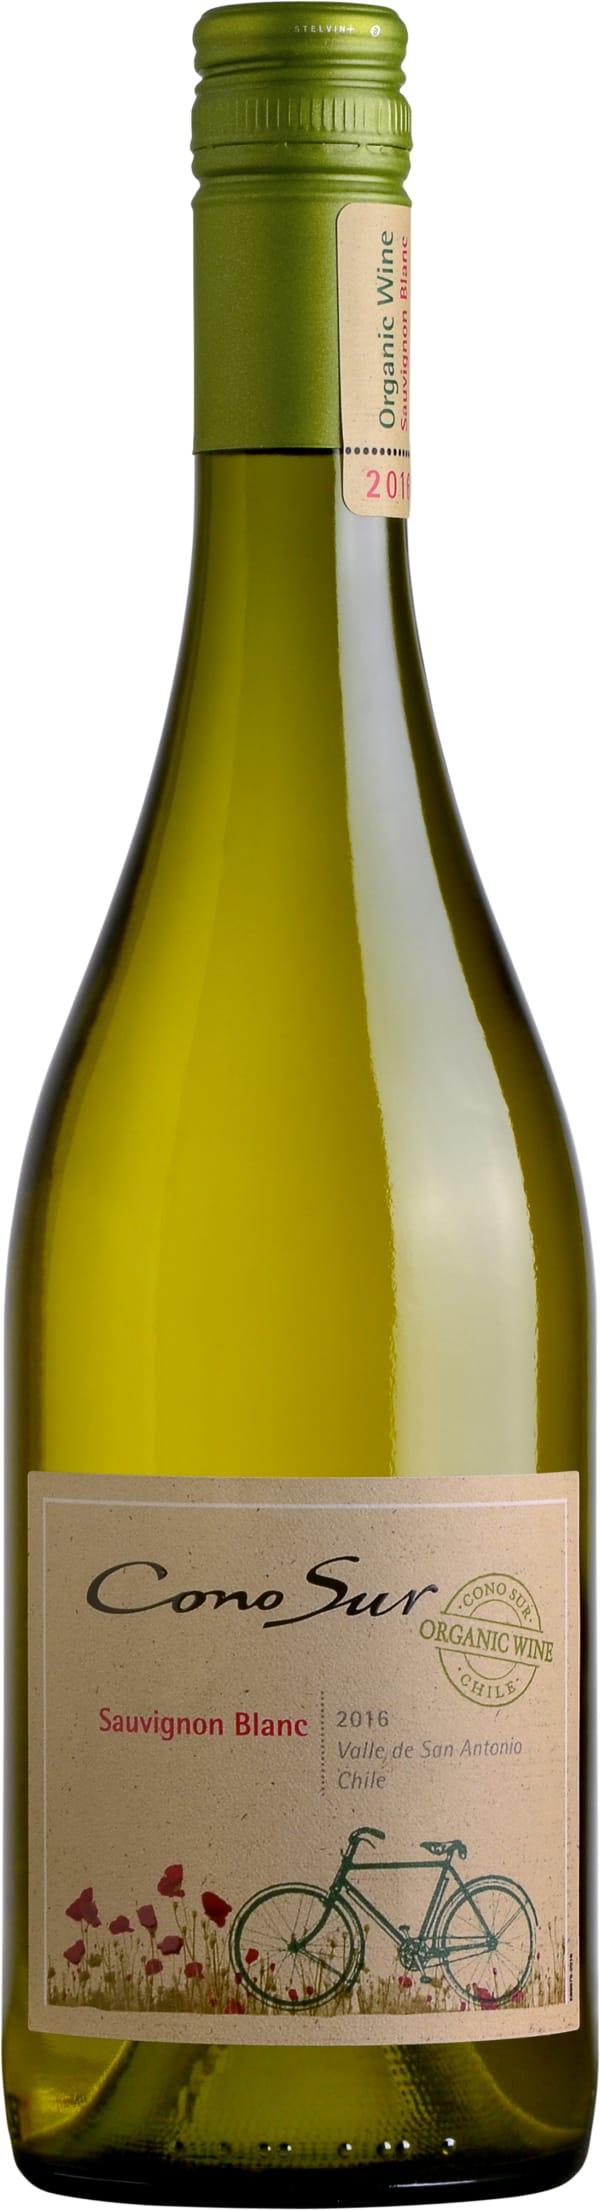 Cono Sur Organic Sauvignon Blanc 2019